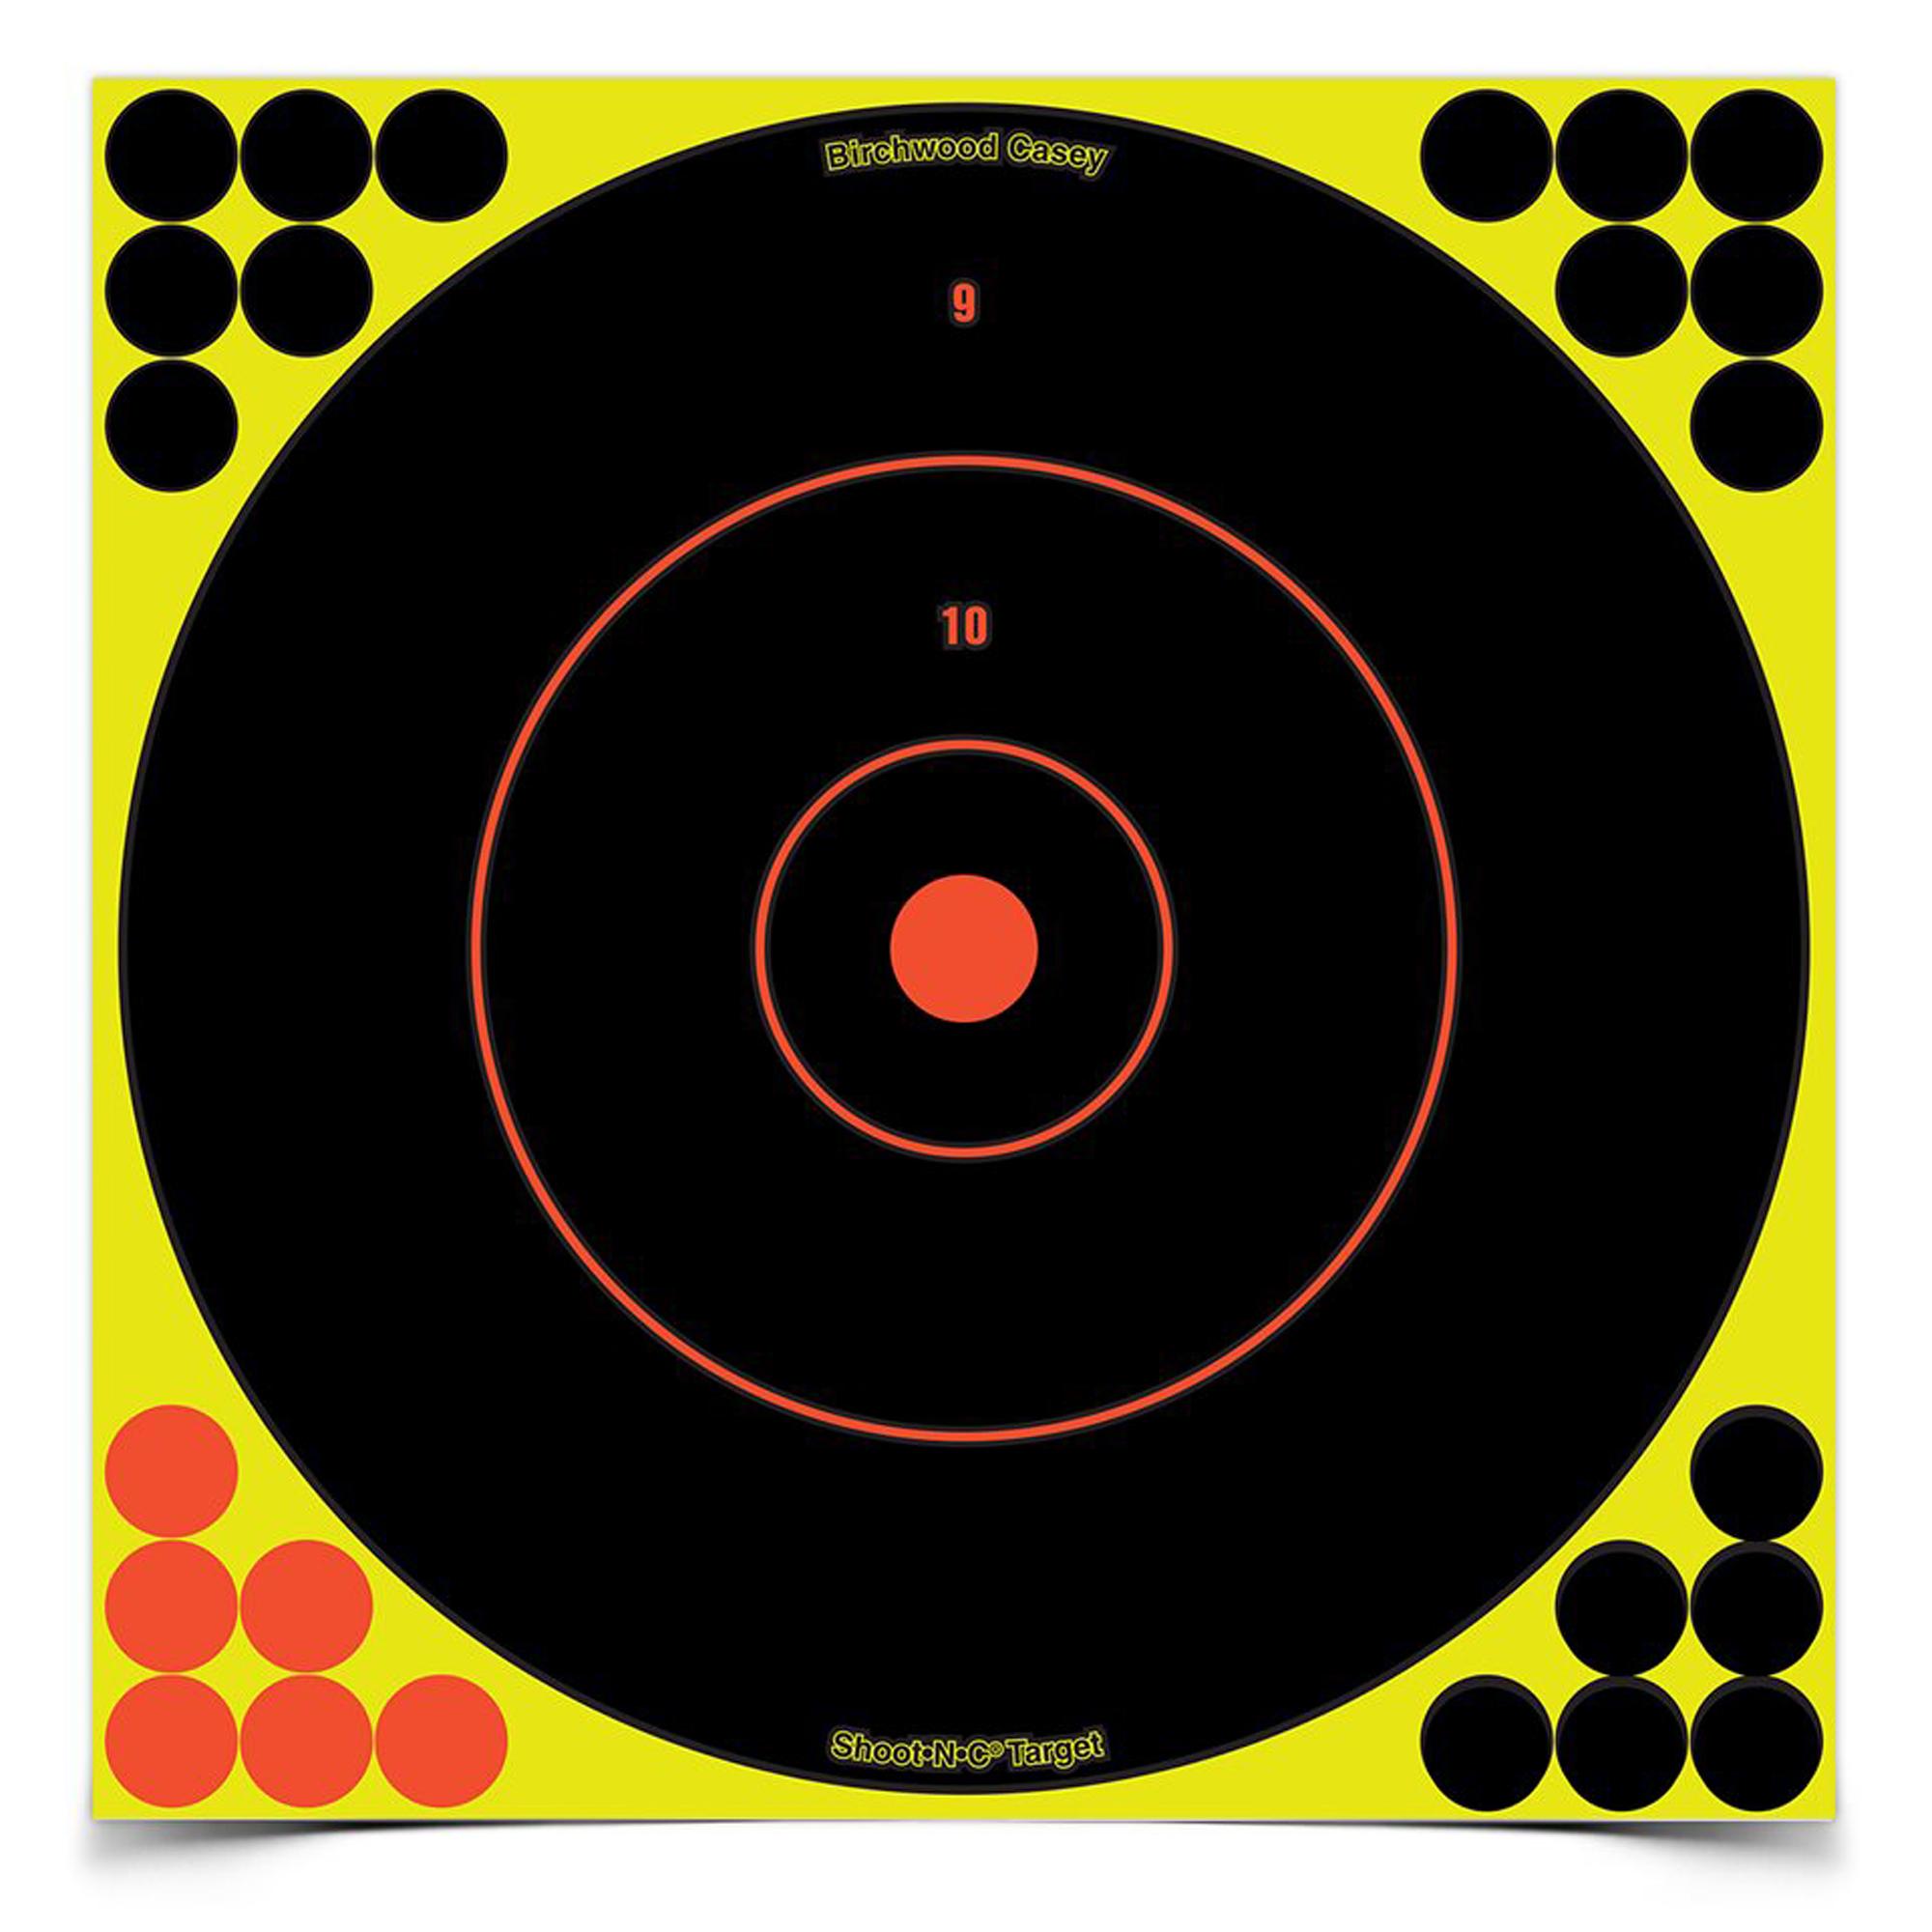 "B/c Sht-n-c Rnd Bullseye Tgt 12-12"""